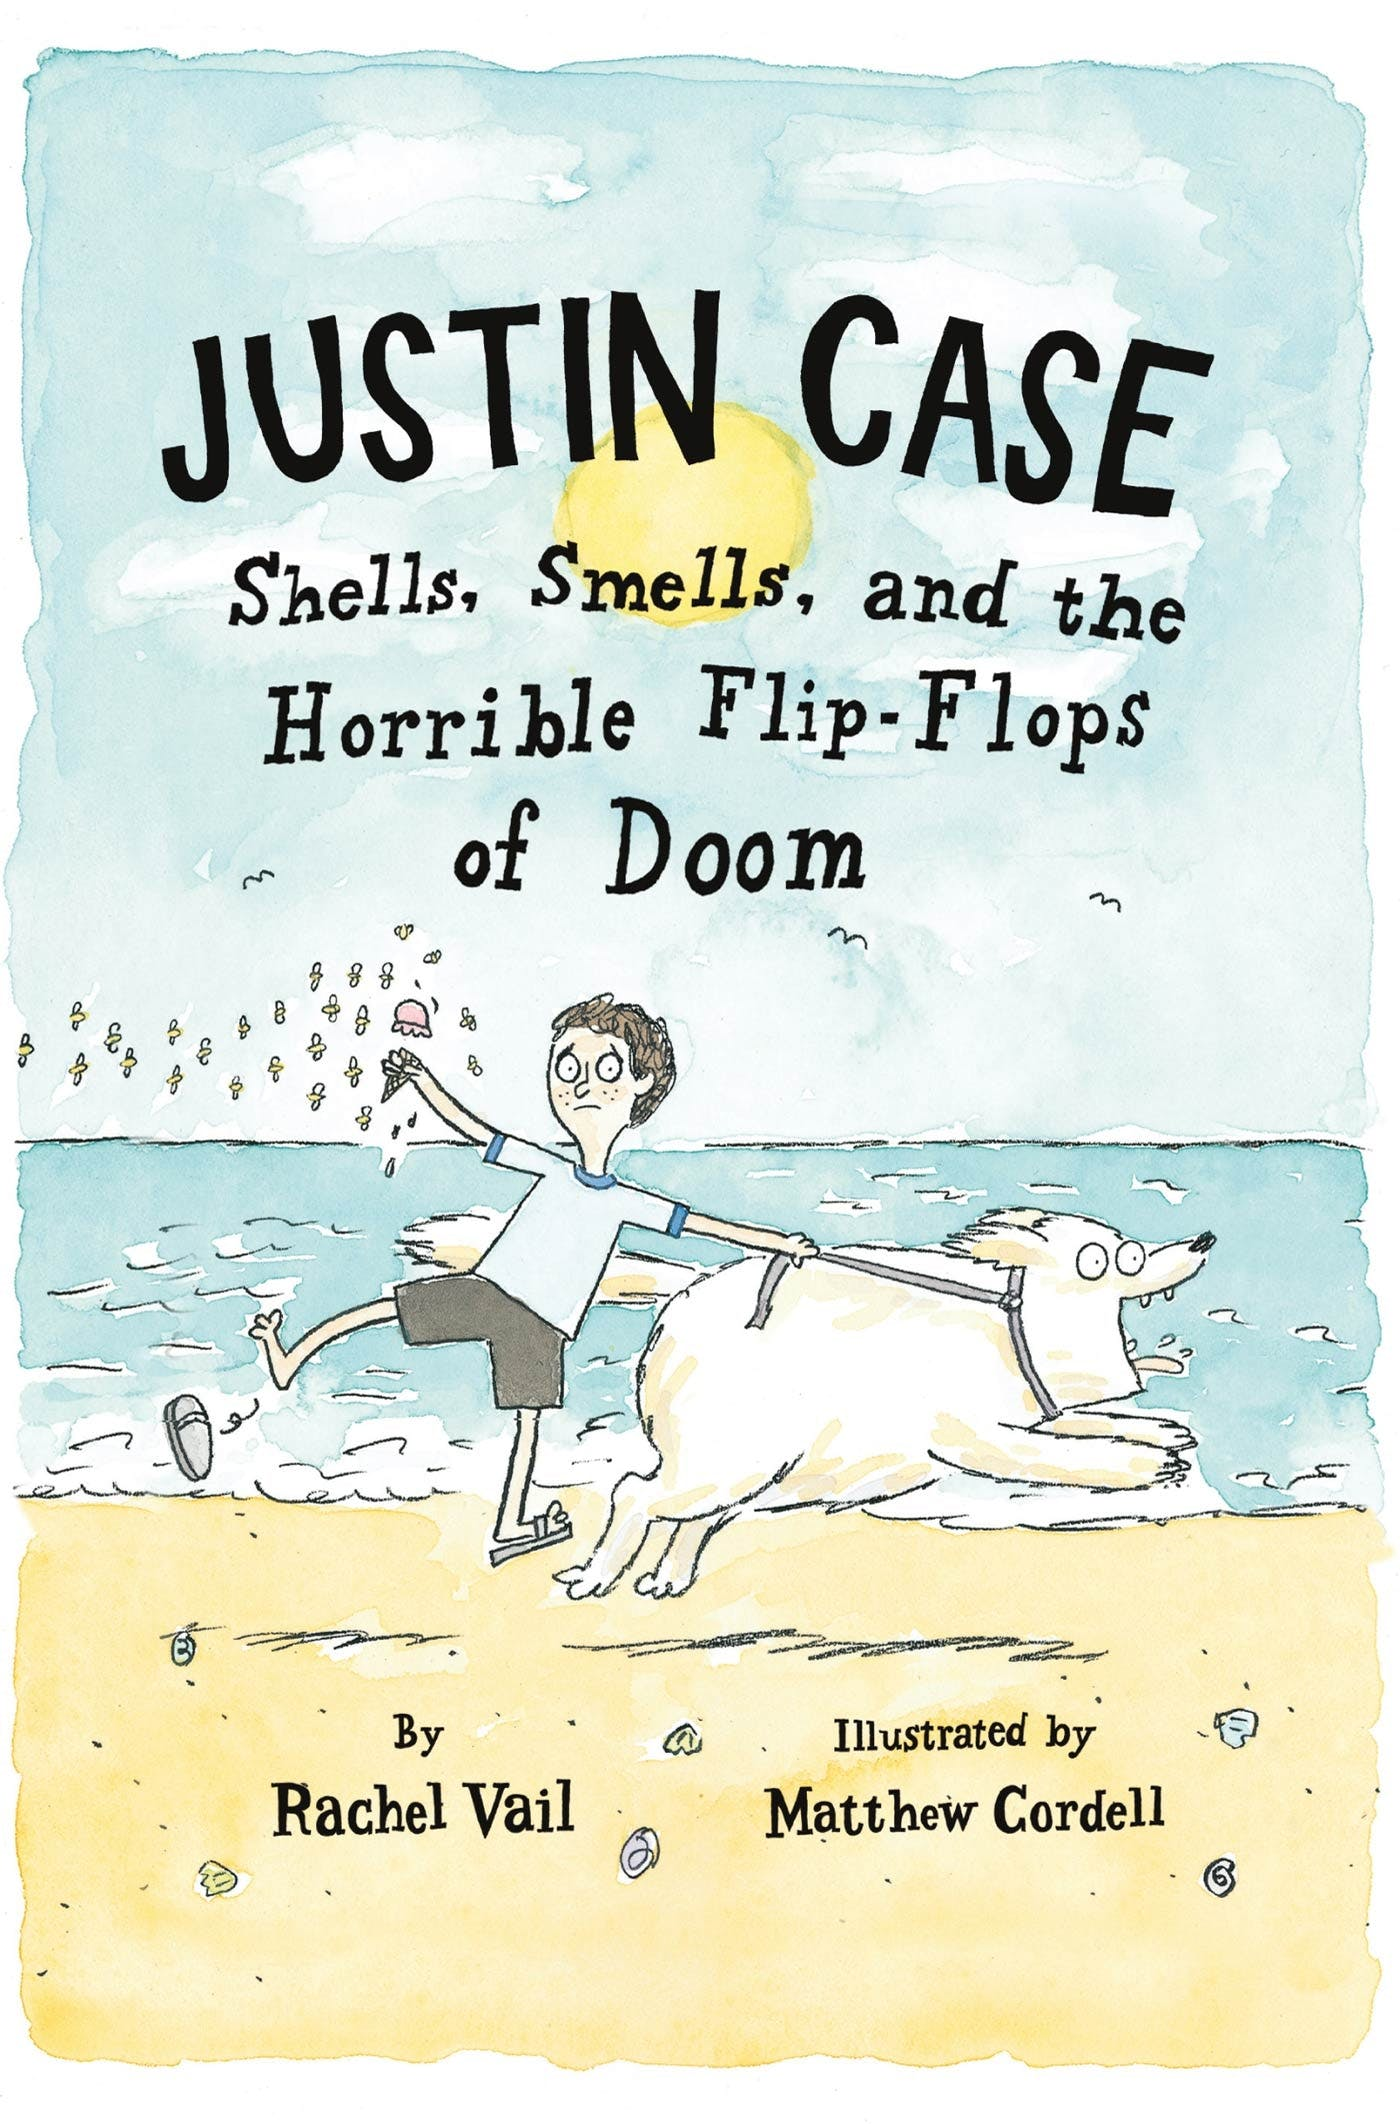 Image of Justin Case: Shells, Smells, and the Horrible Flip-Flops of Doom